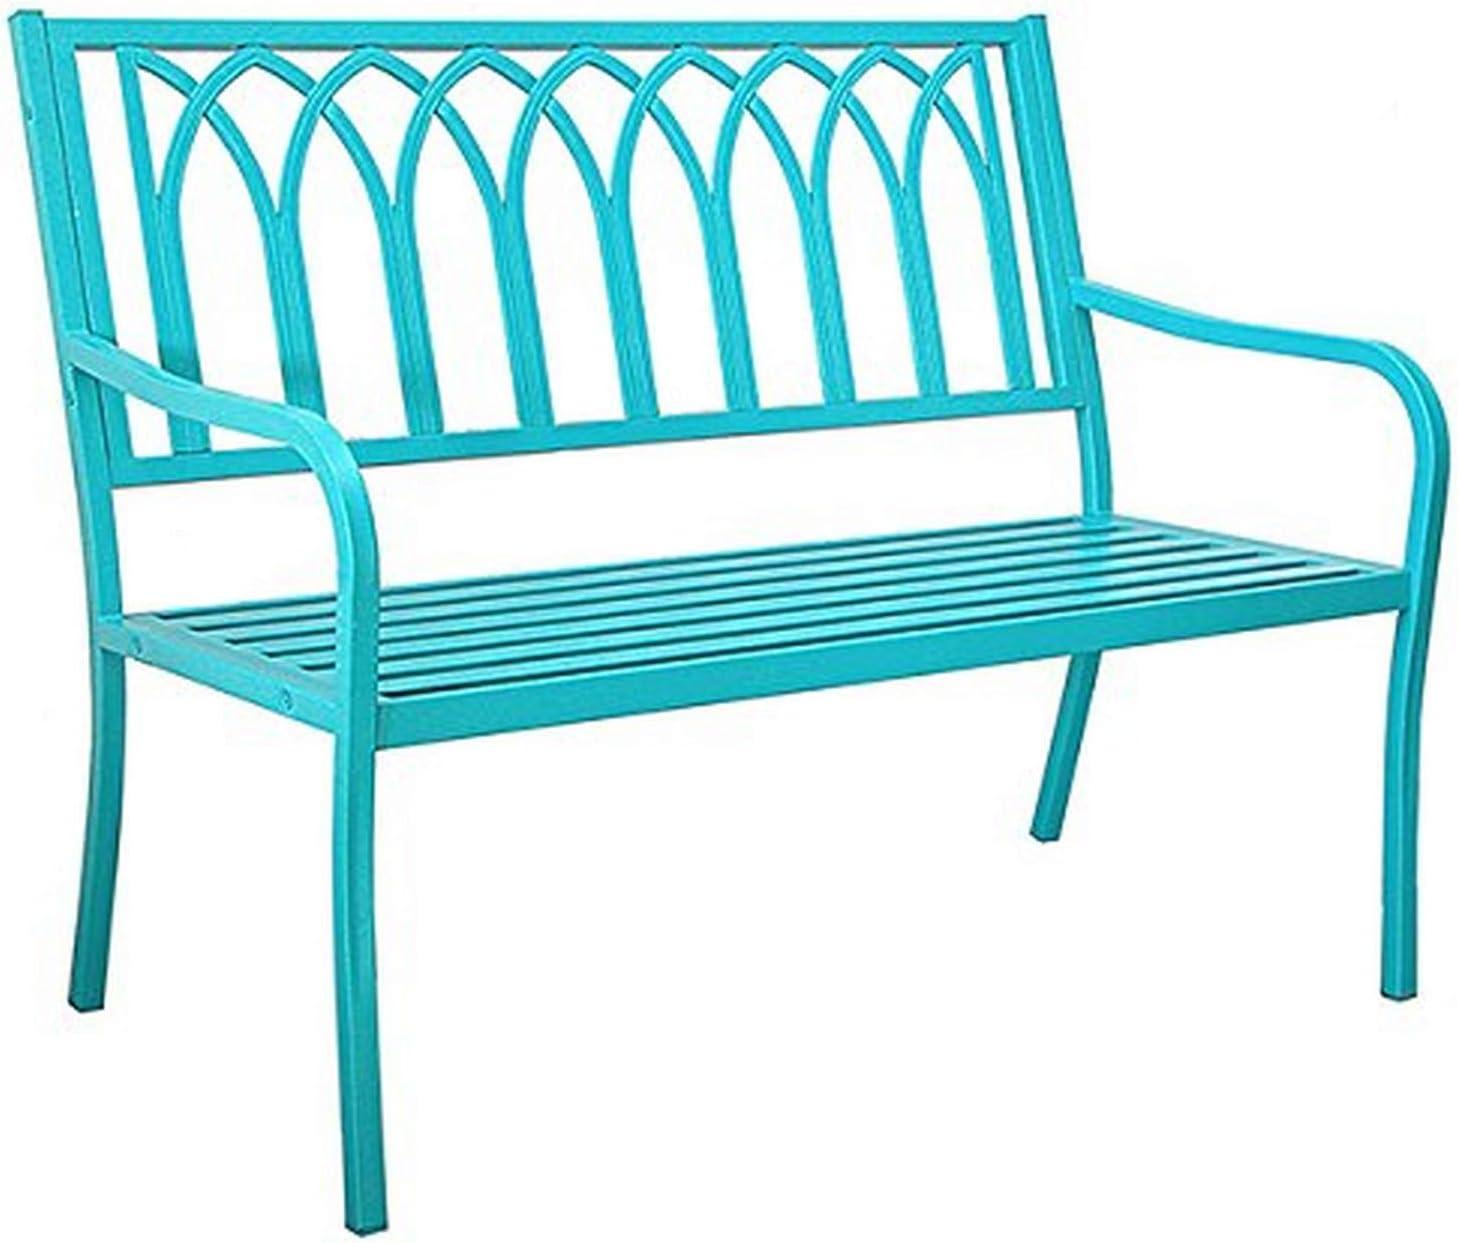 Innova Hearth and Home Lakeside Metal Steel Bench